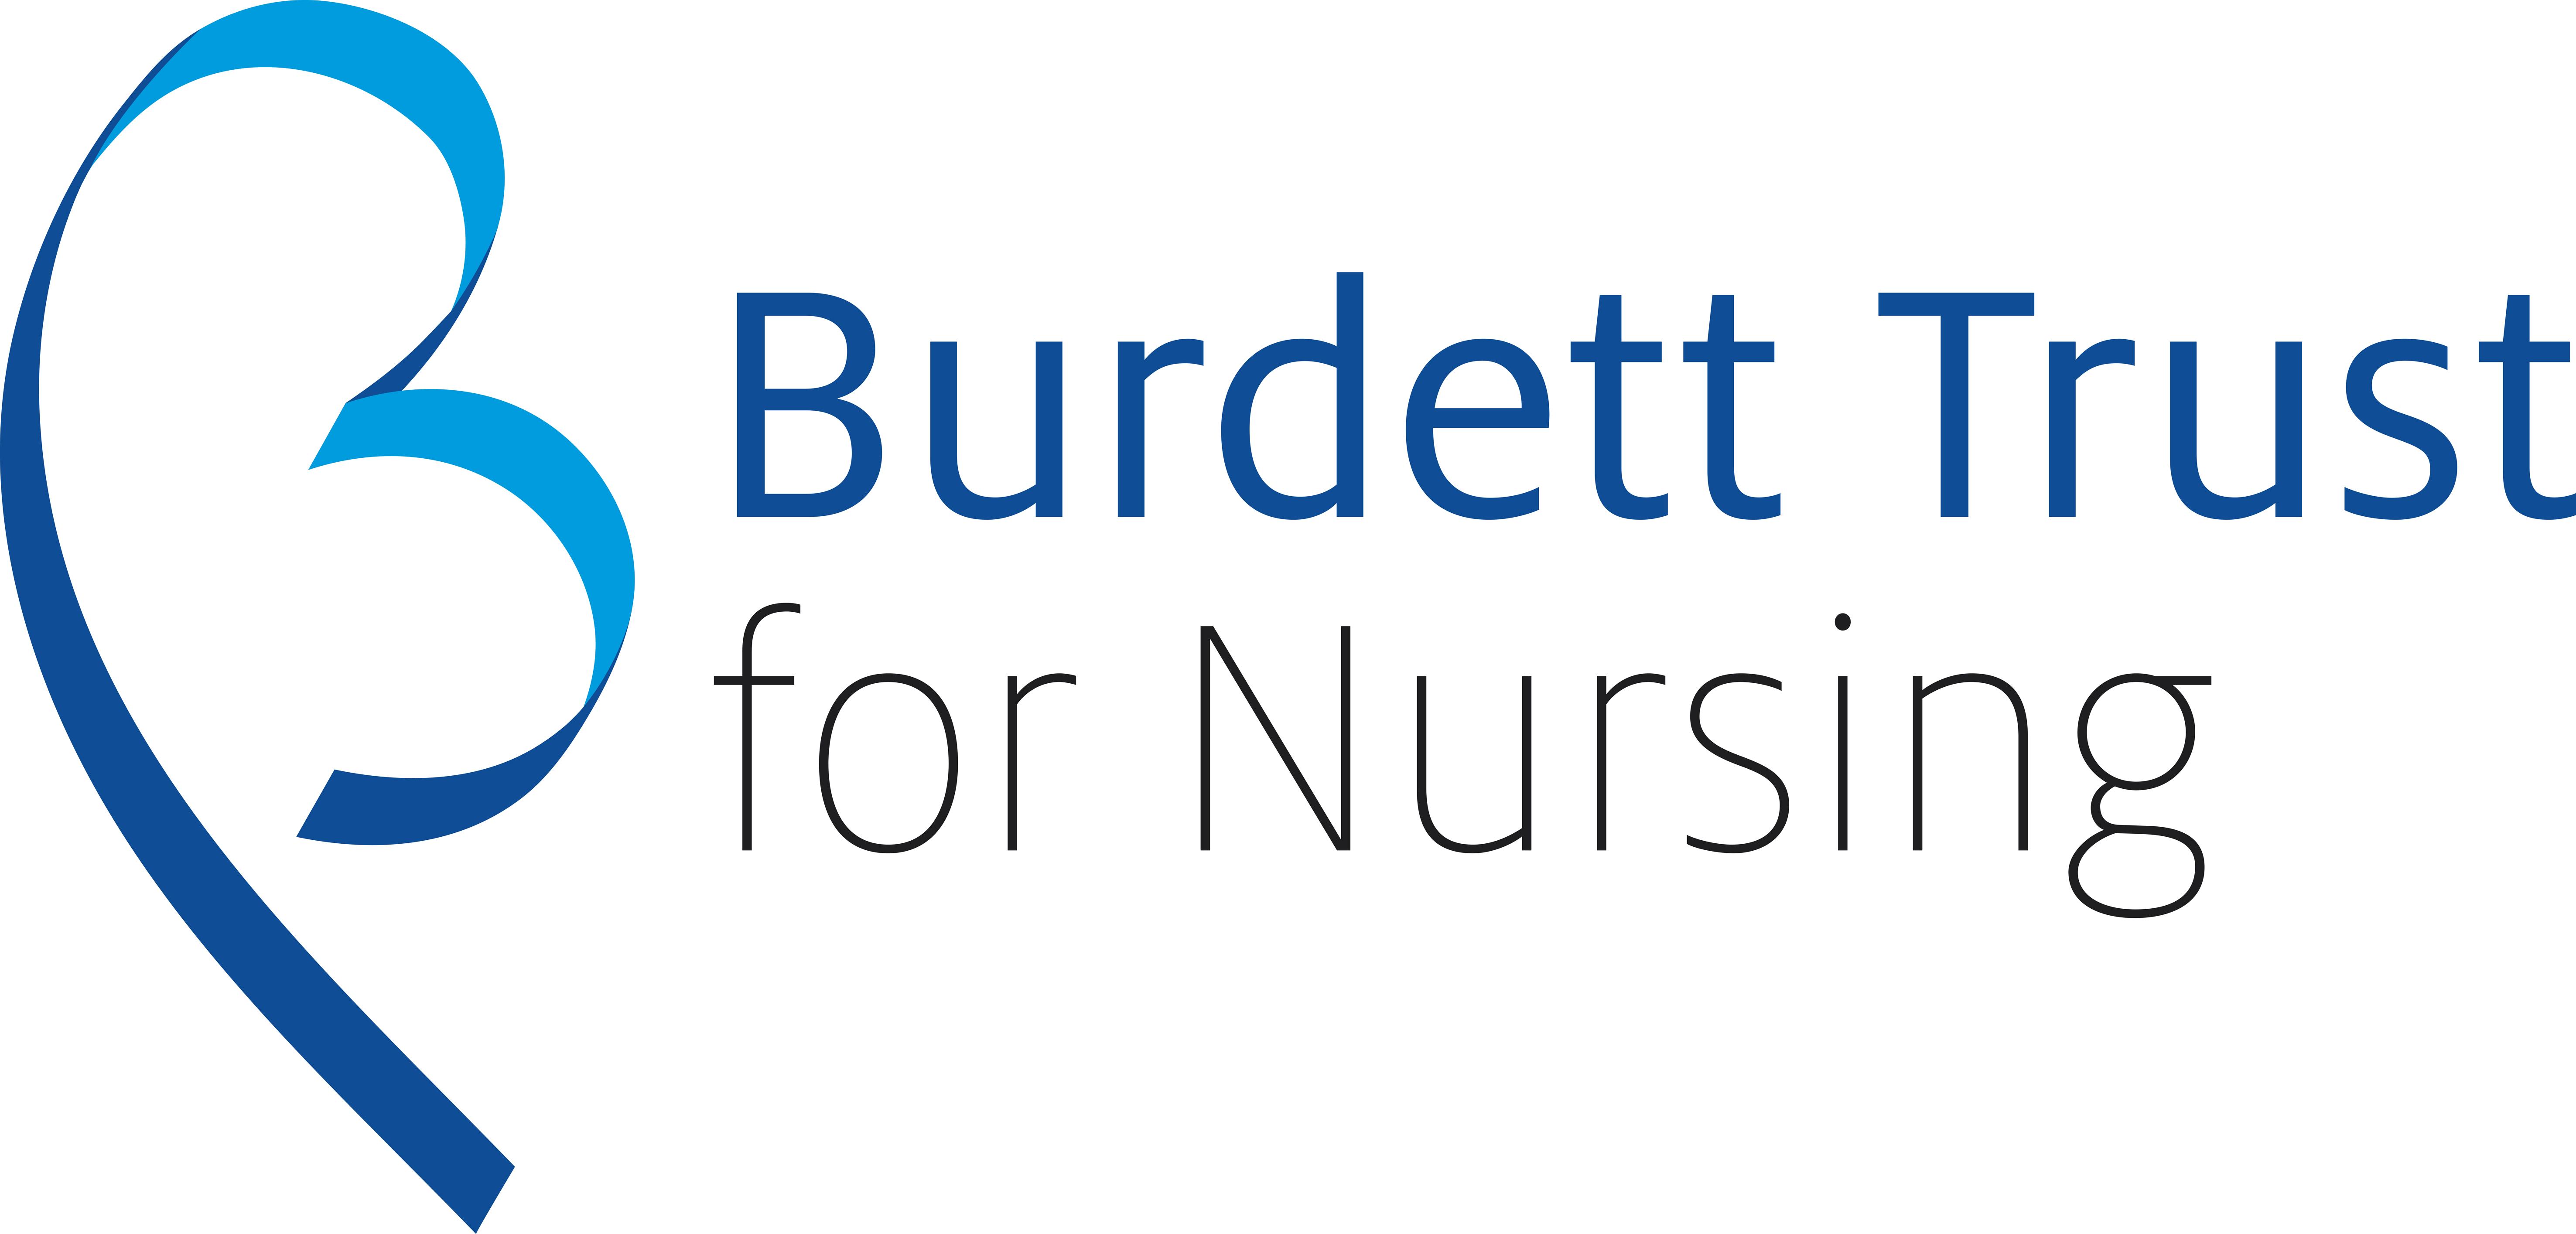 BU Awarded Research Grant To Improve Nurse Retention